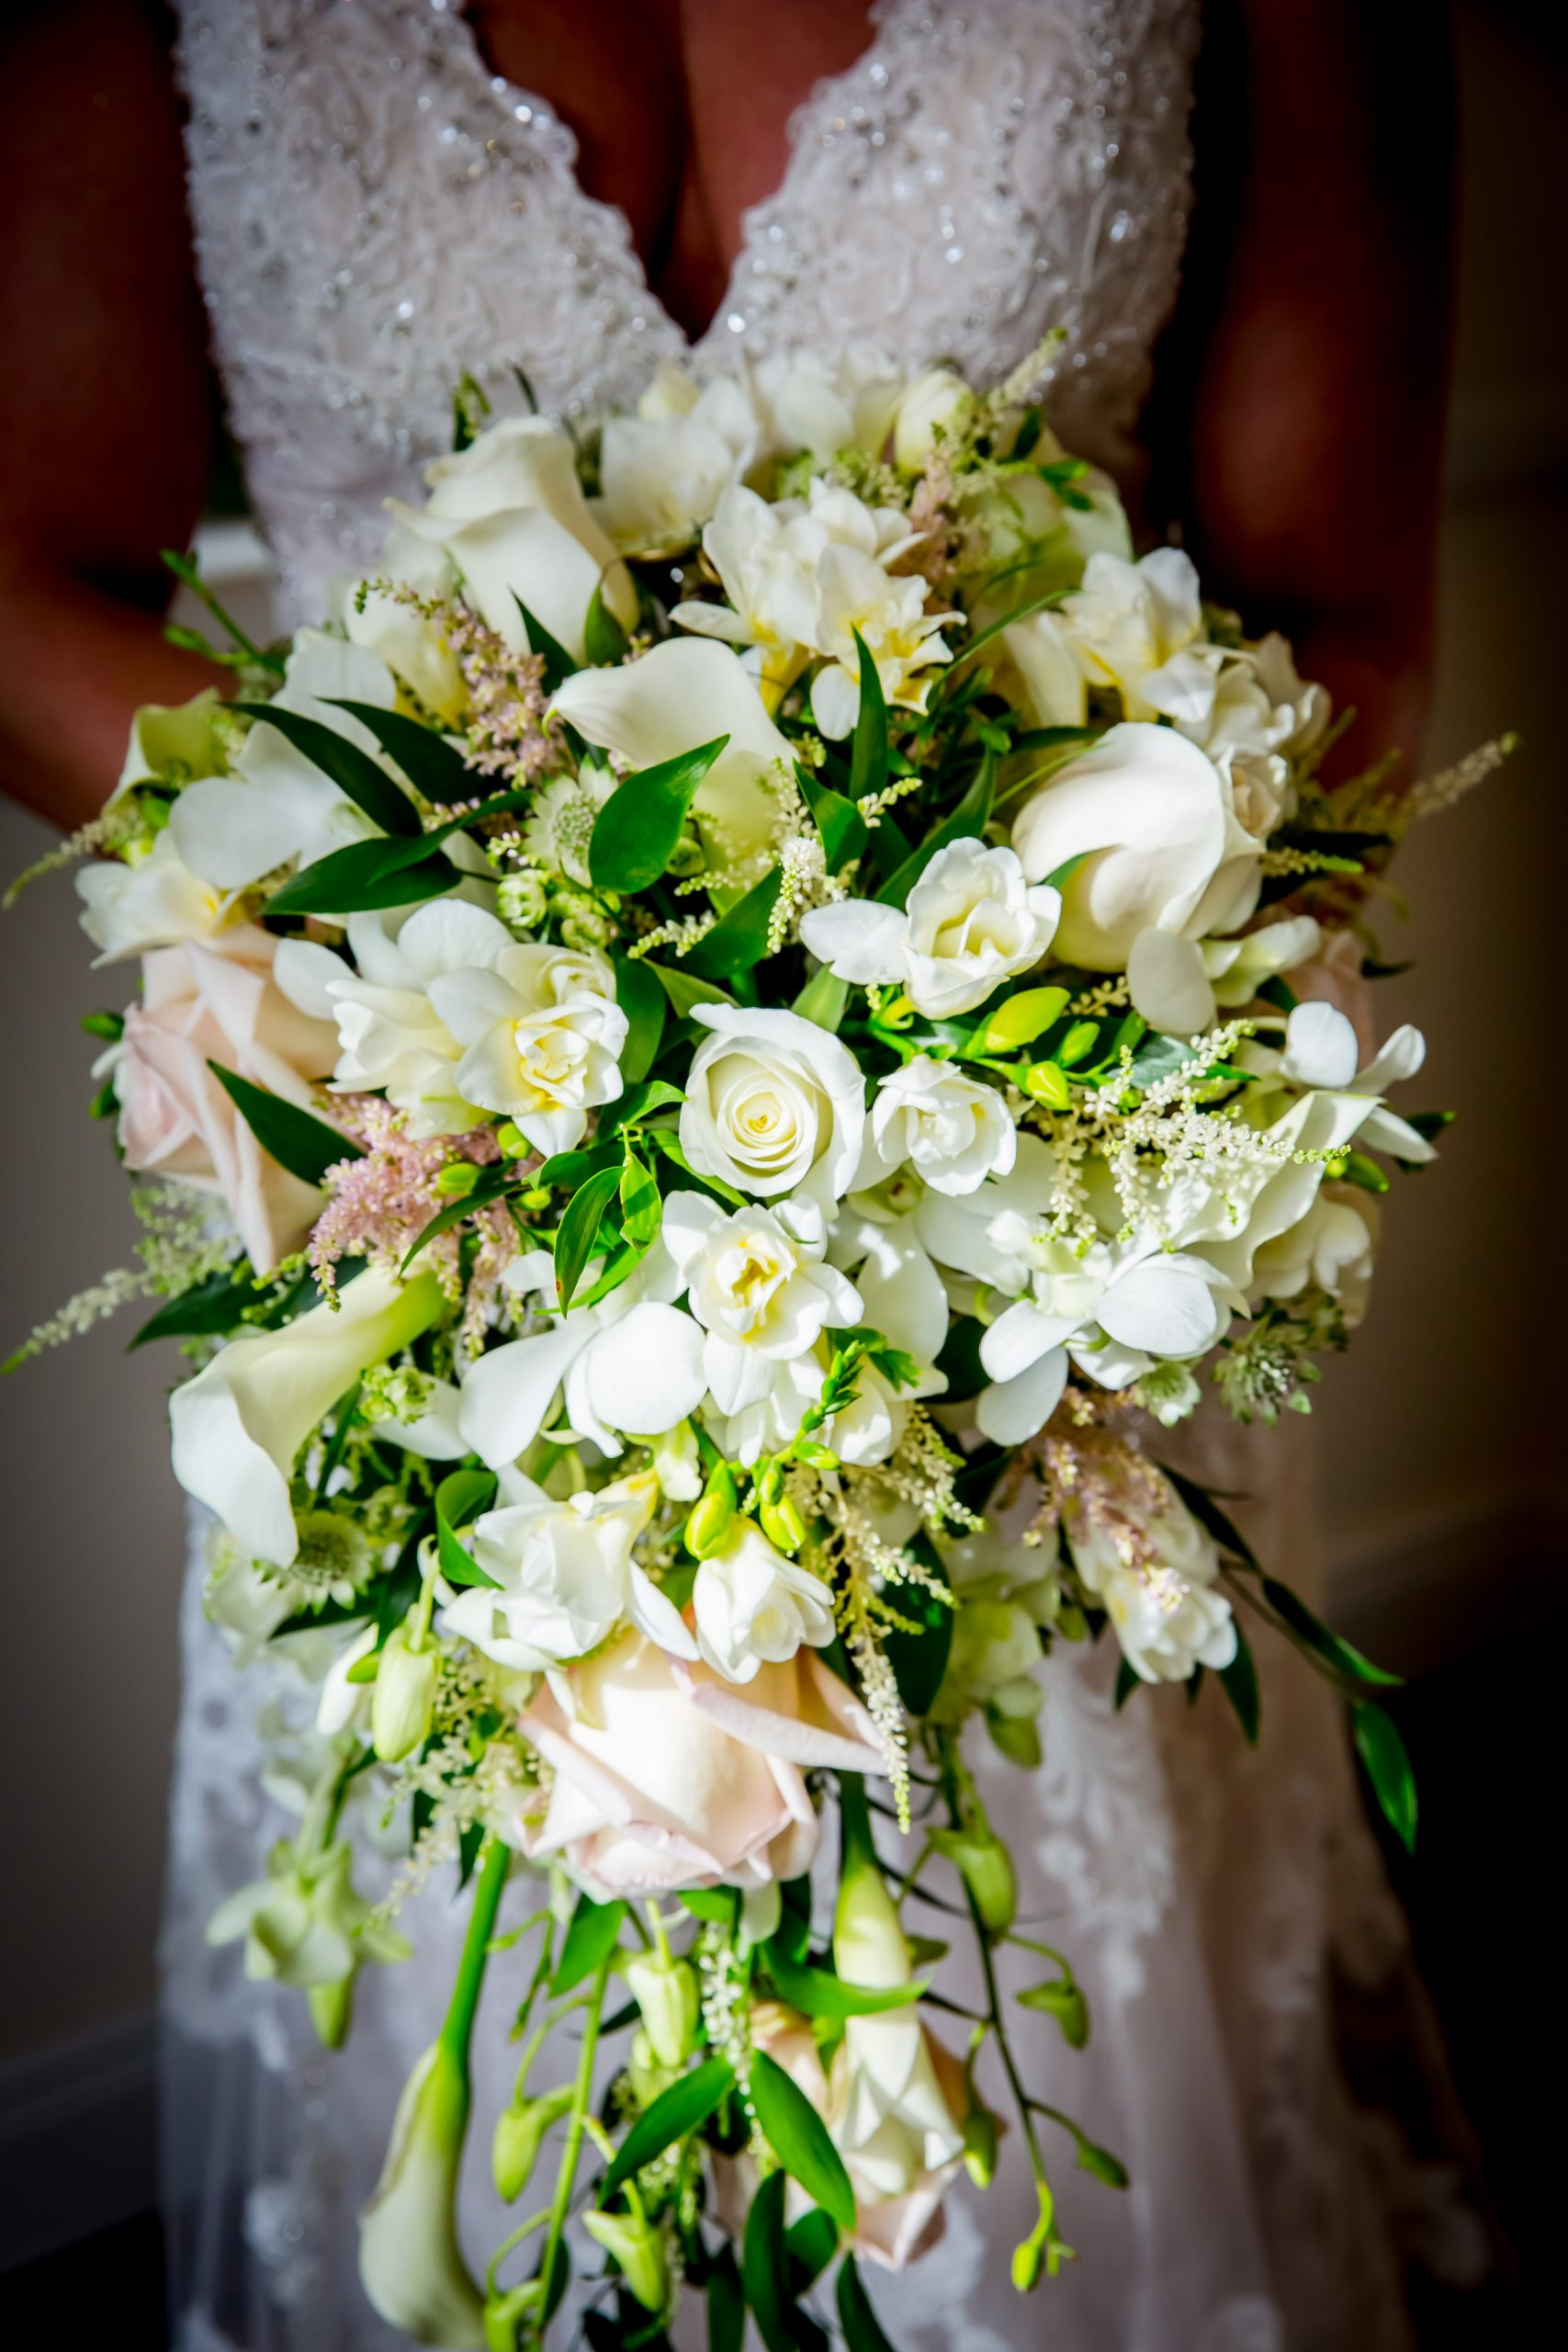 Victori_Rob_Mohawk River Country Club Wedding-20.jpg